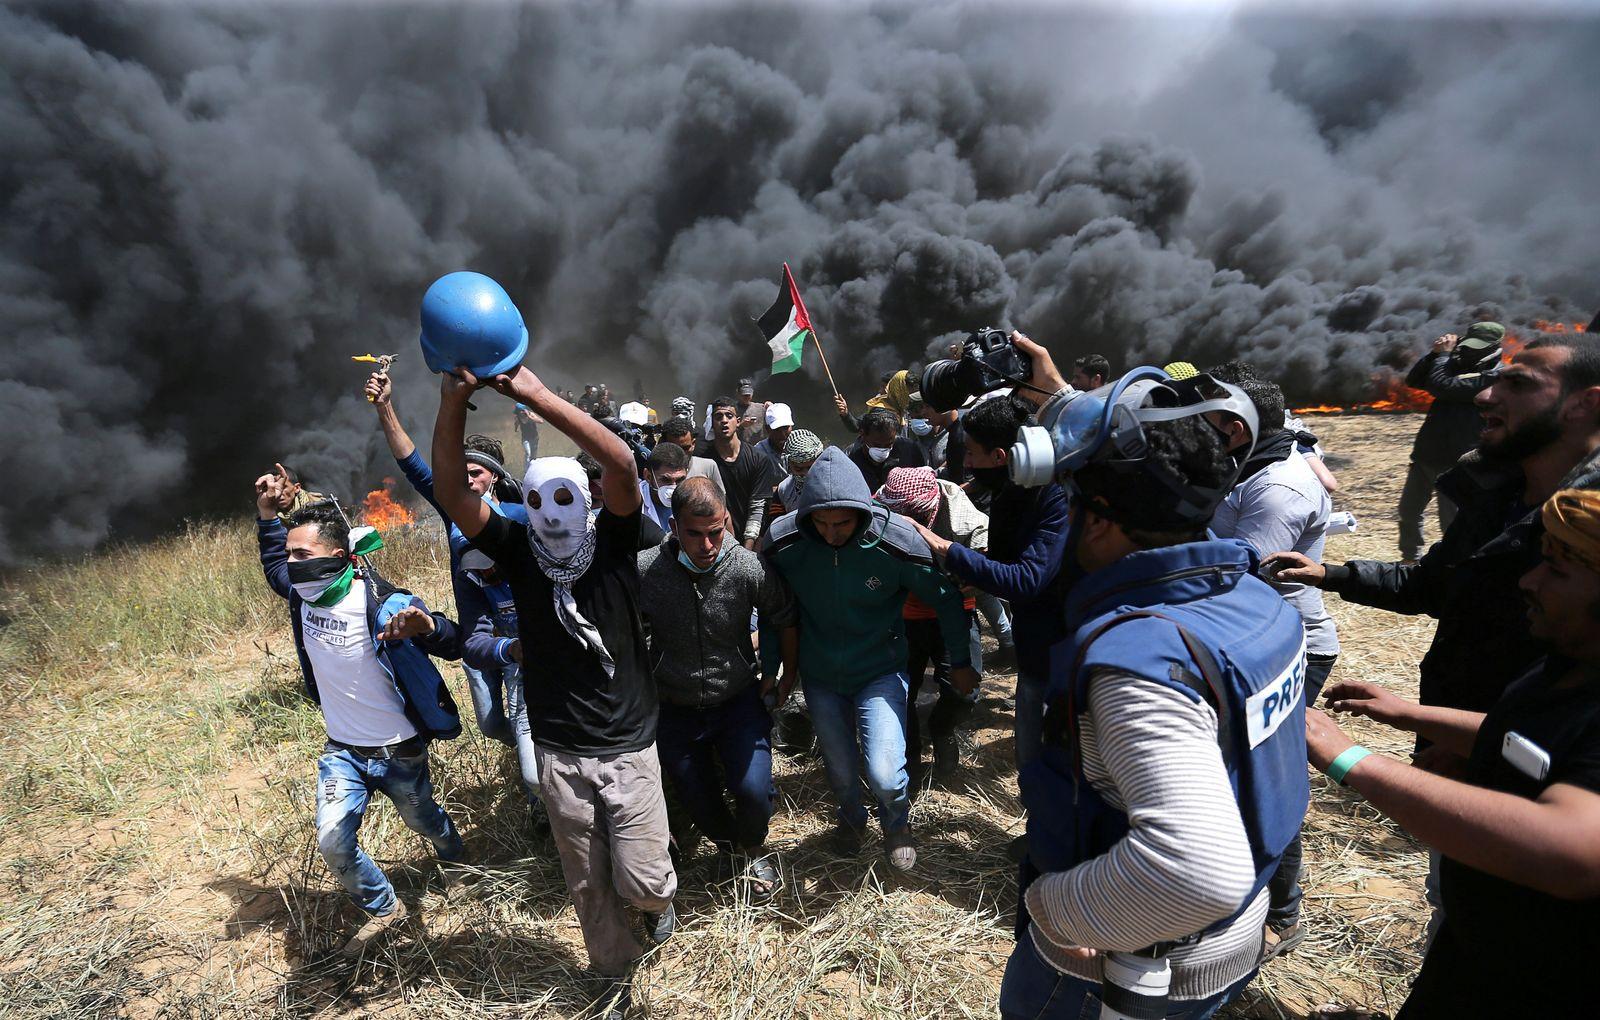 ISRAEL PALESTINIA Gaza Proteste